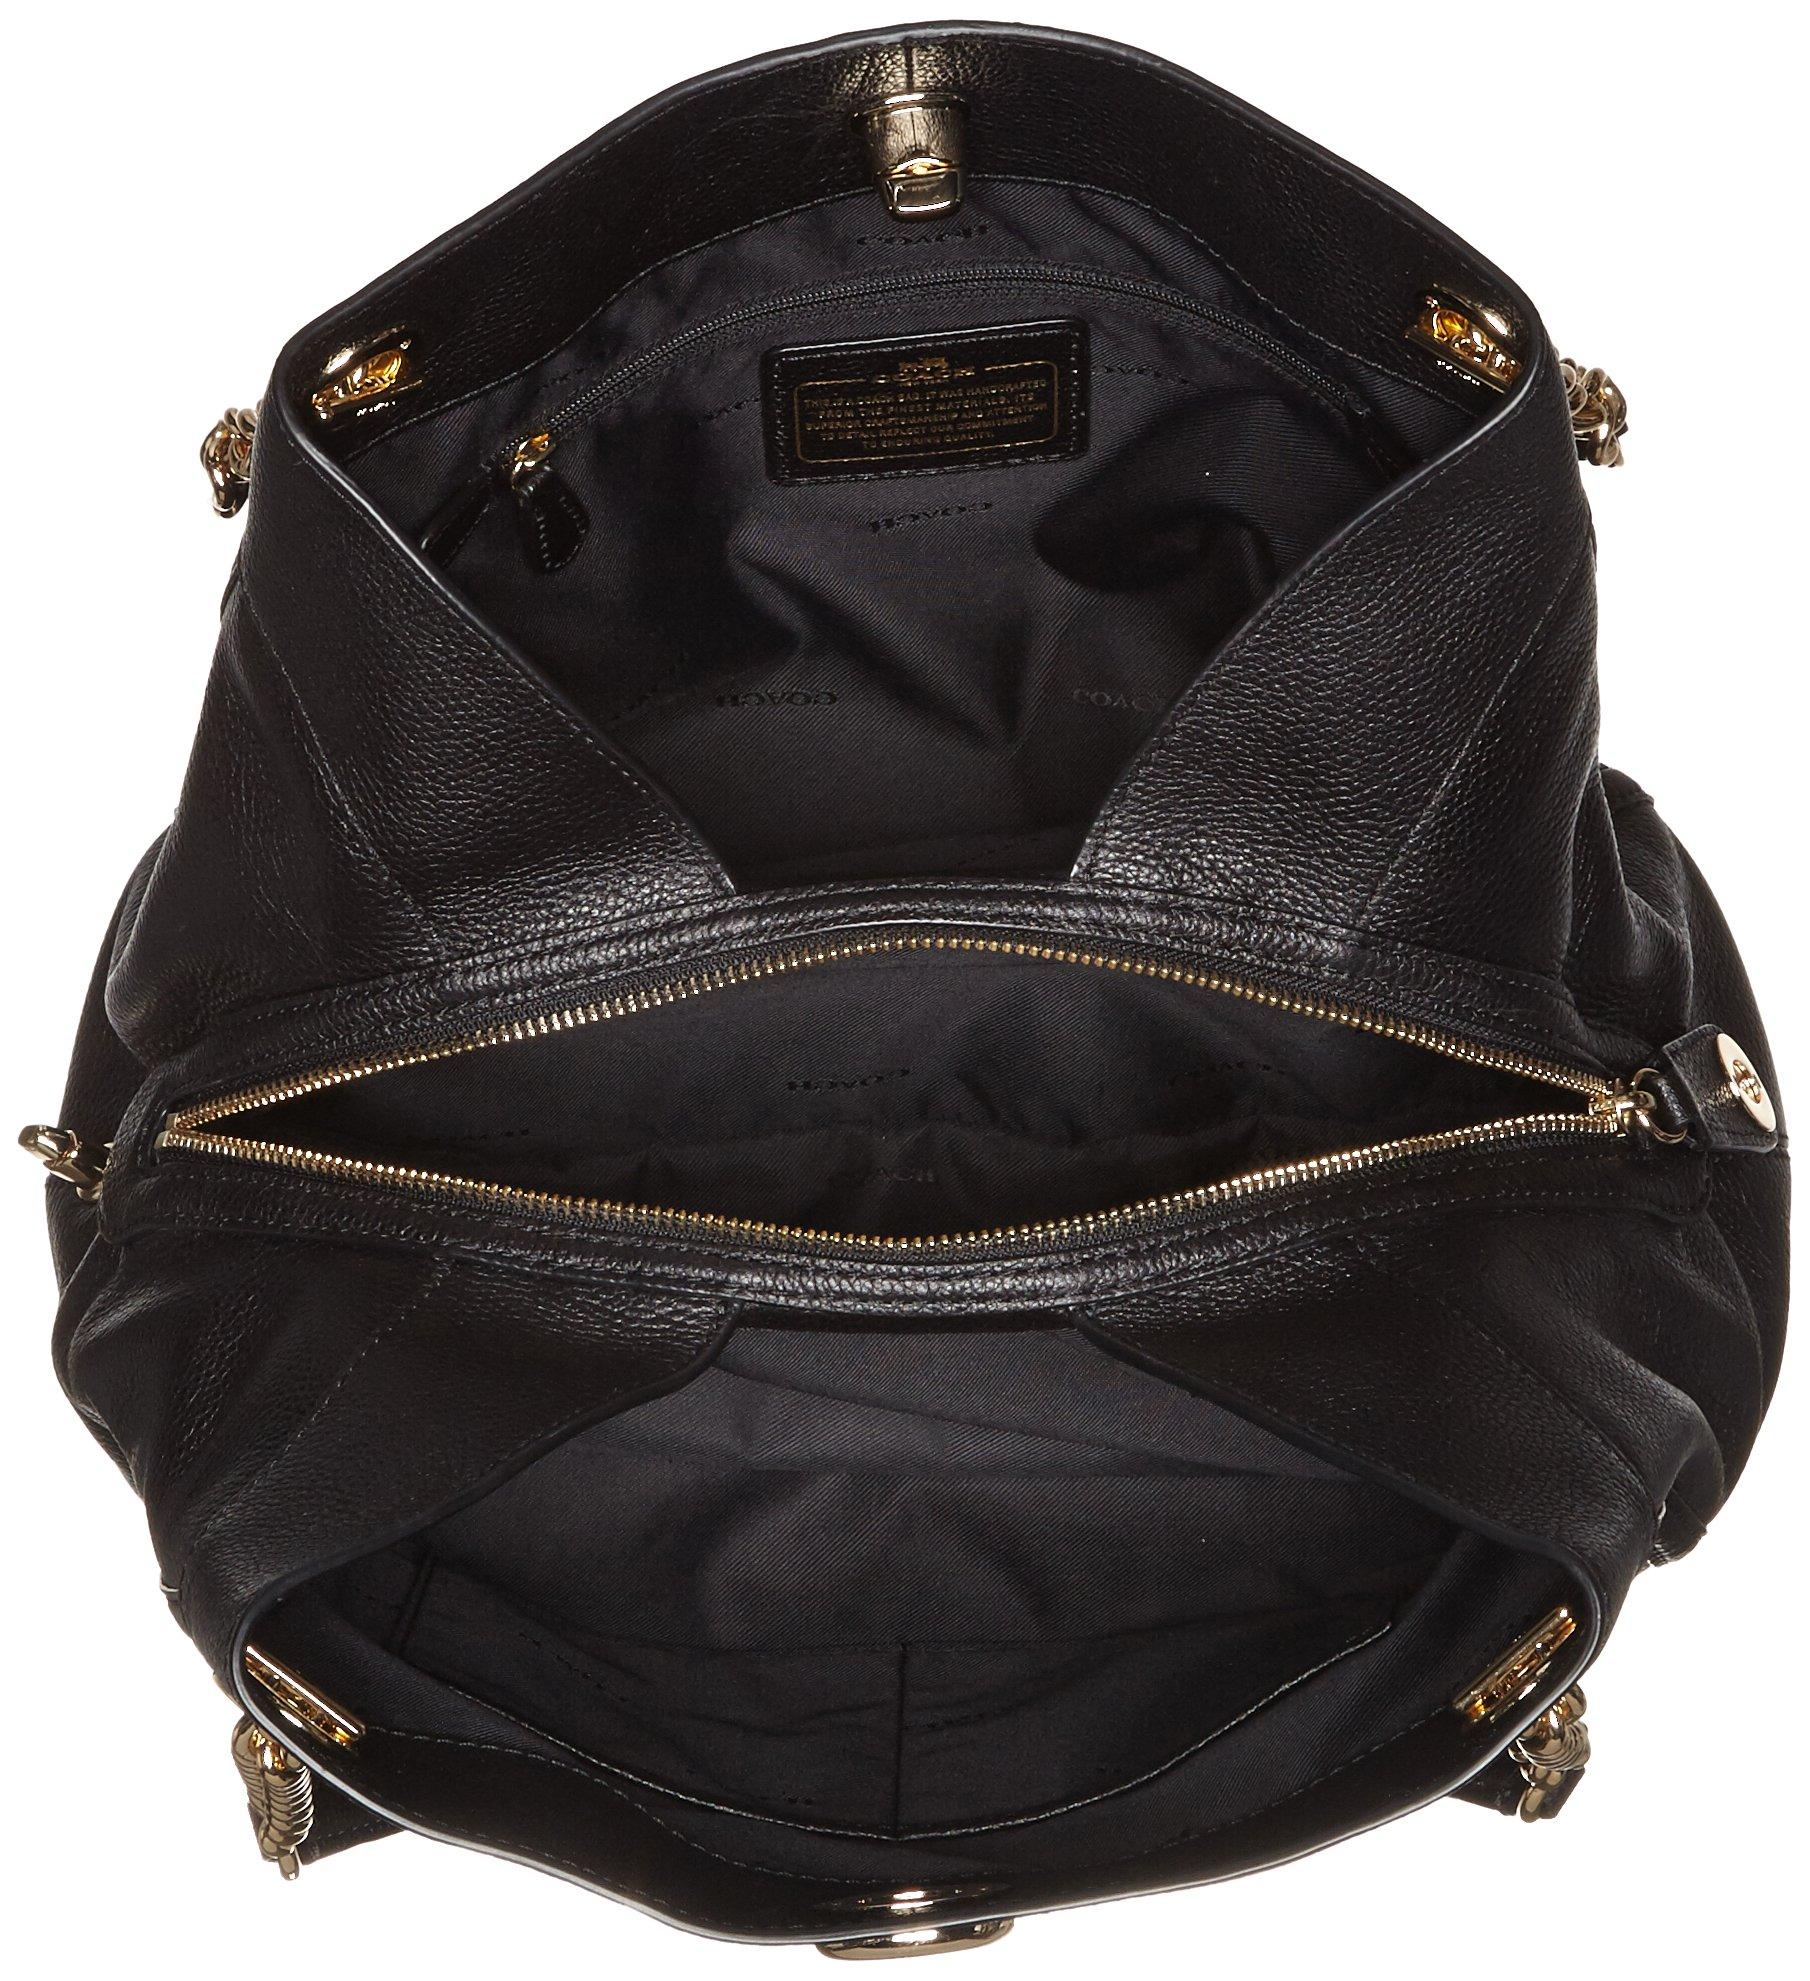 COACH Women's Turnlock Edie LI/Black Shoulder Bag by Coach (Image #5)